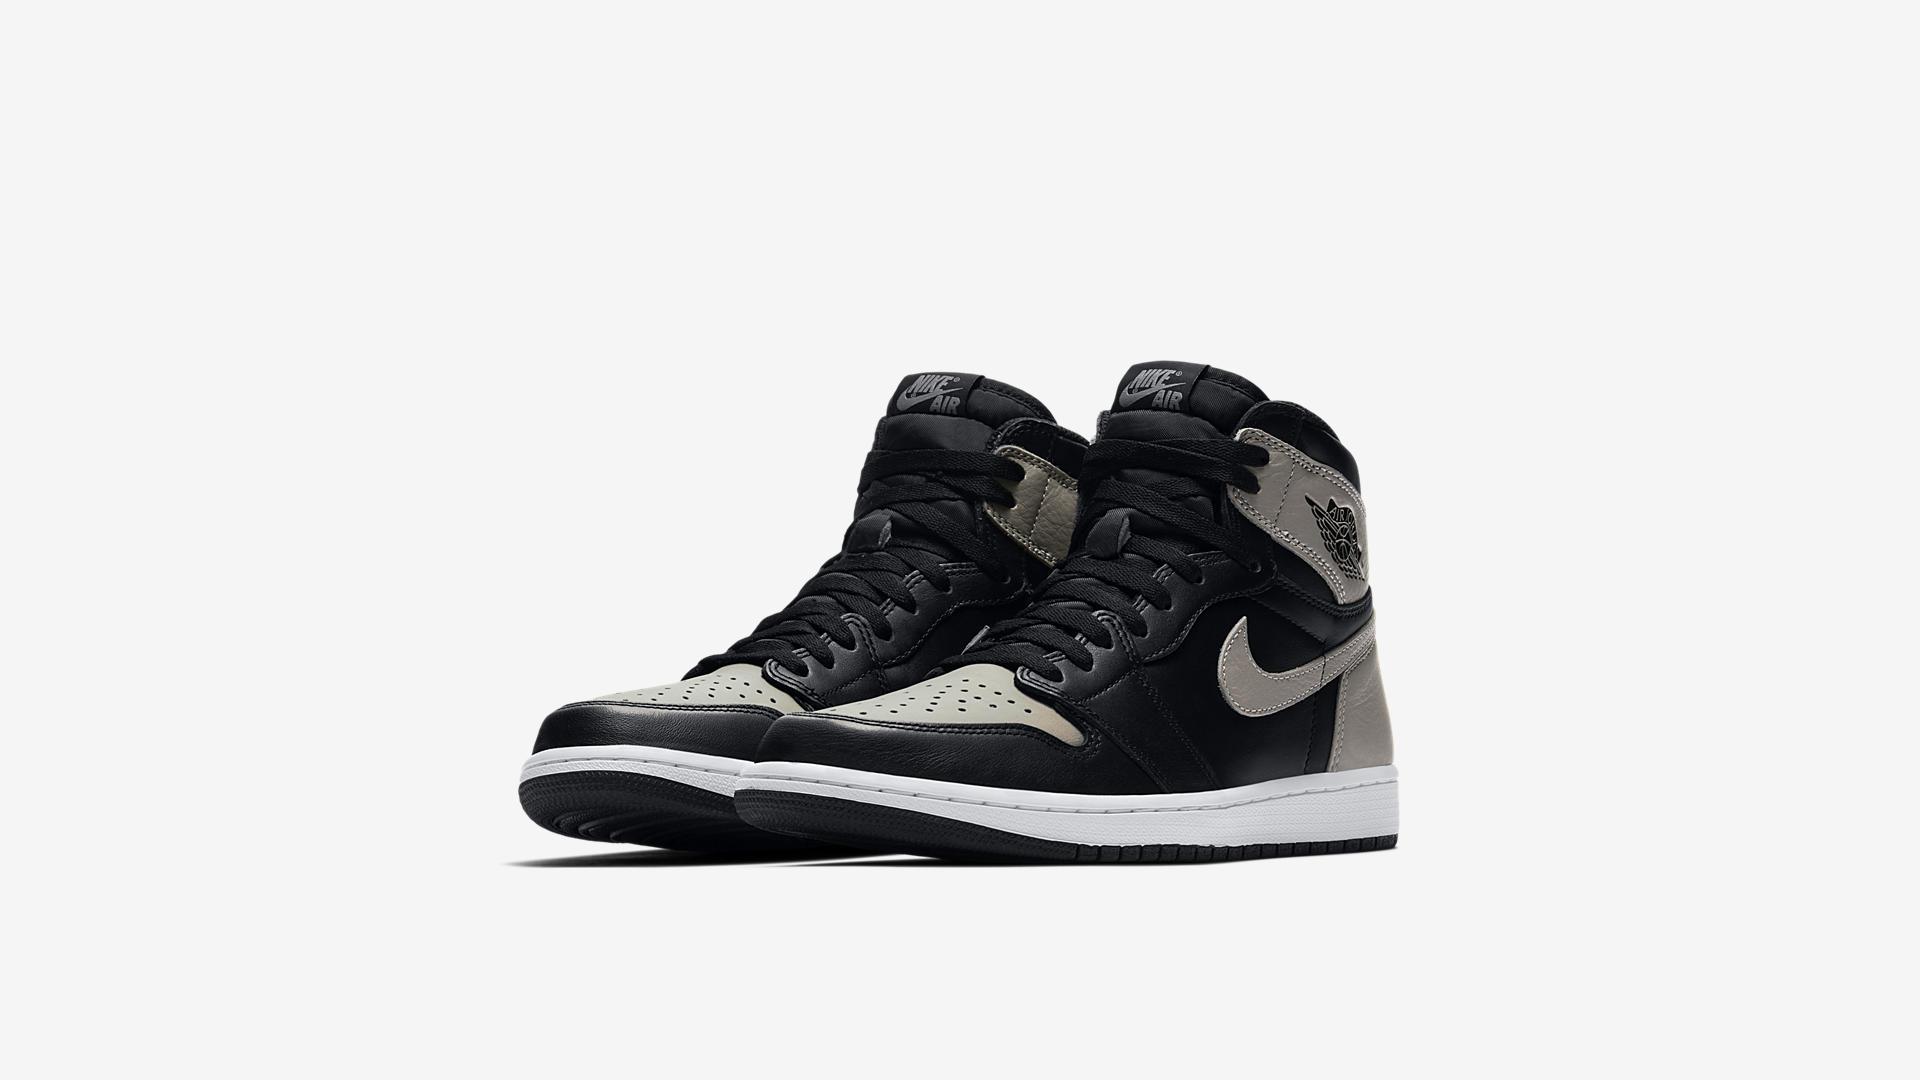 555088 013 Air Jordan 1 Retro High OG Shadow 4